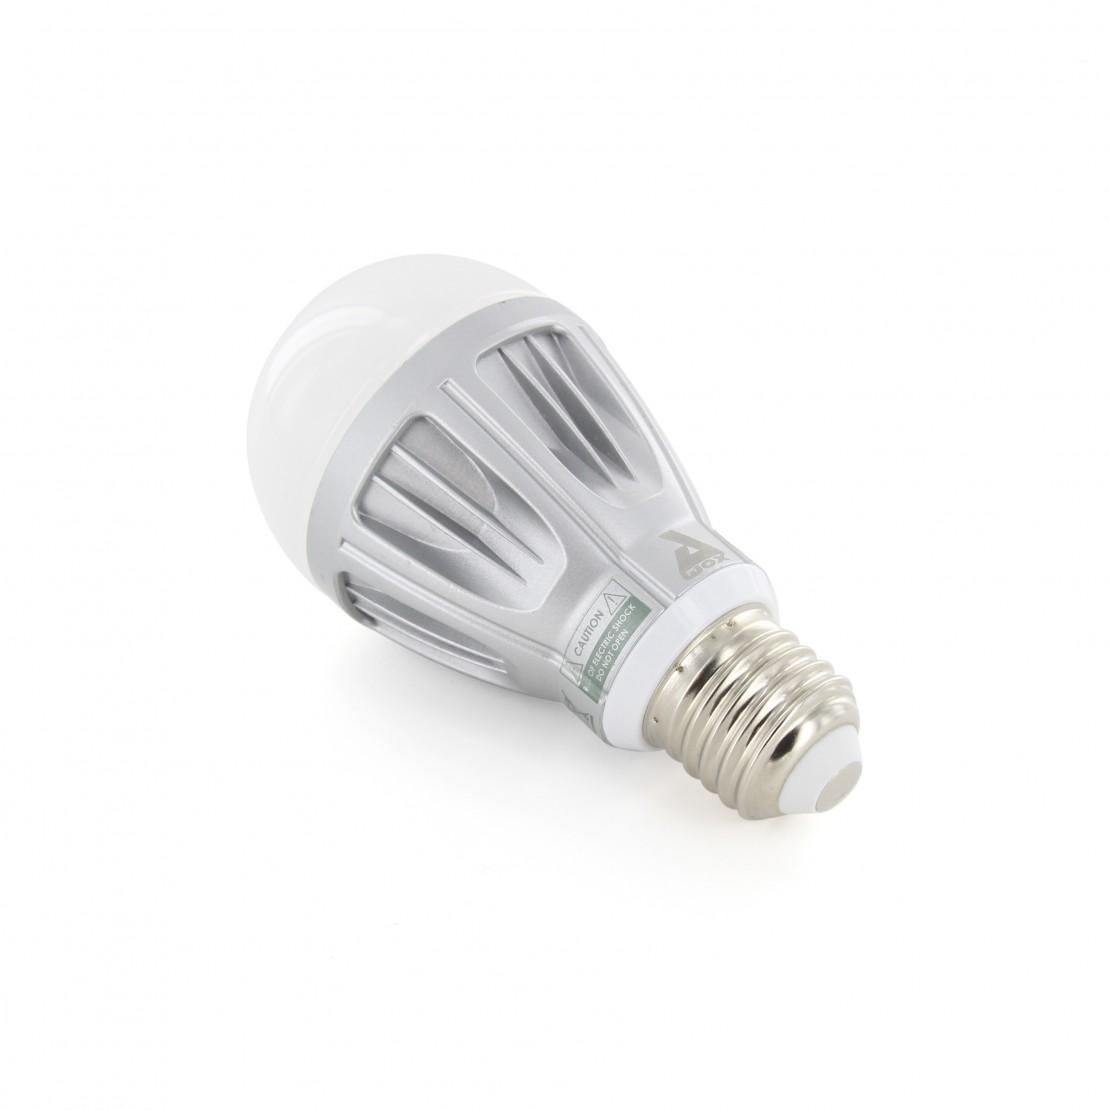 SmartLIGHT - white E27 Bluetooth connected bulb